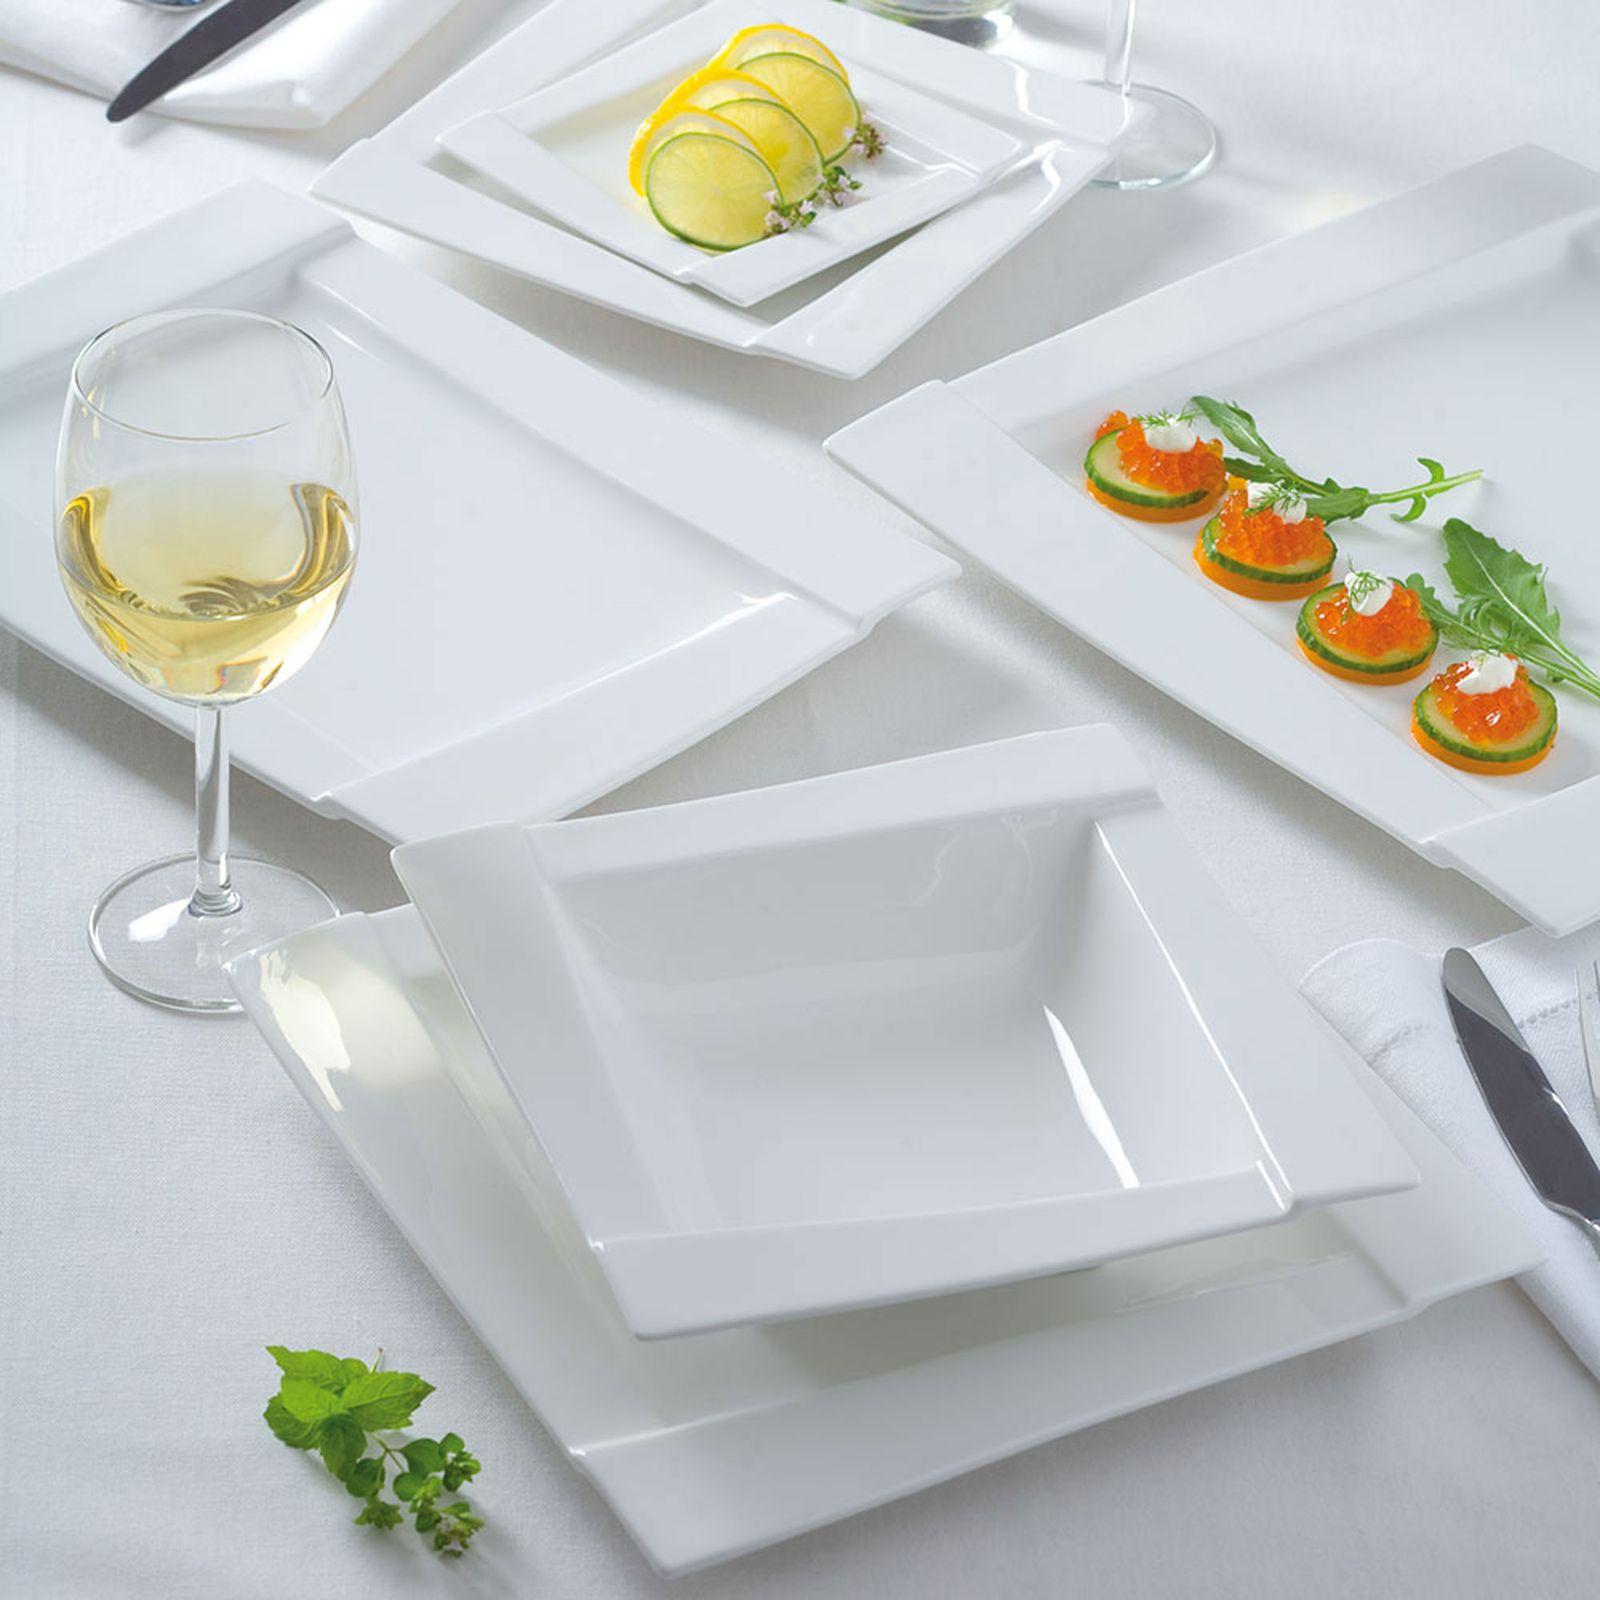 Komplet obiadowy Kubiko 52-elementowy AMBITION